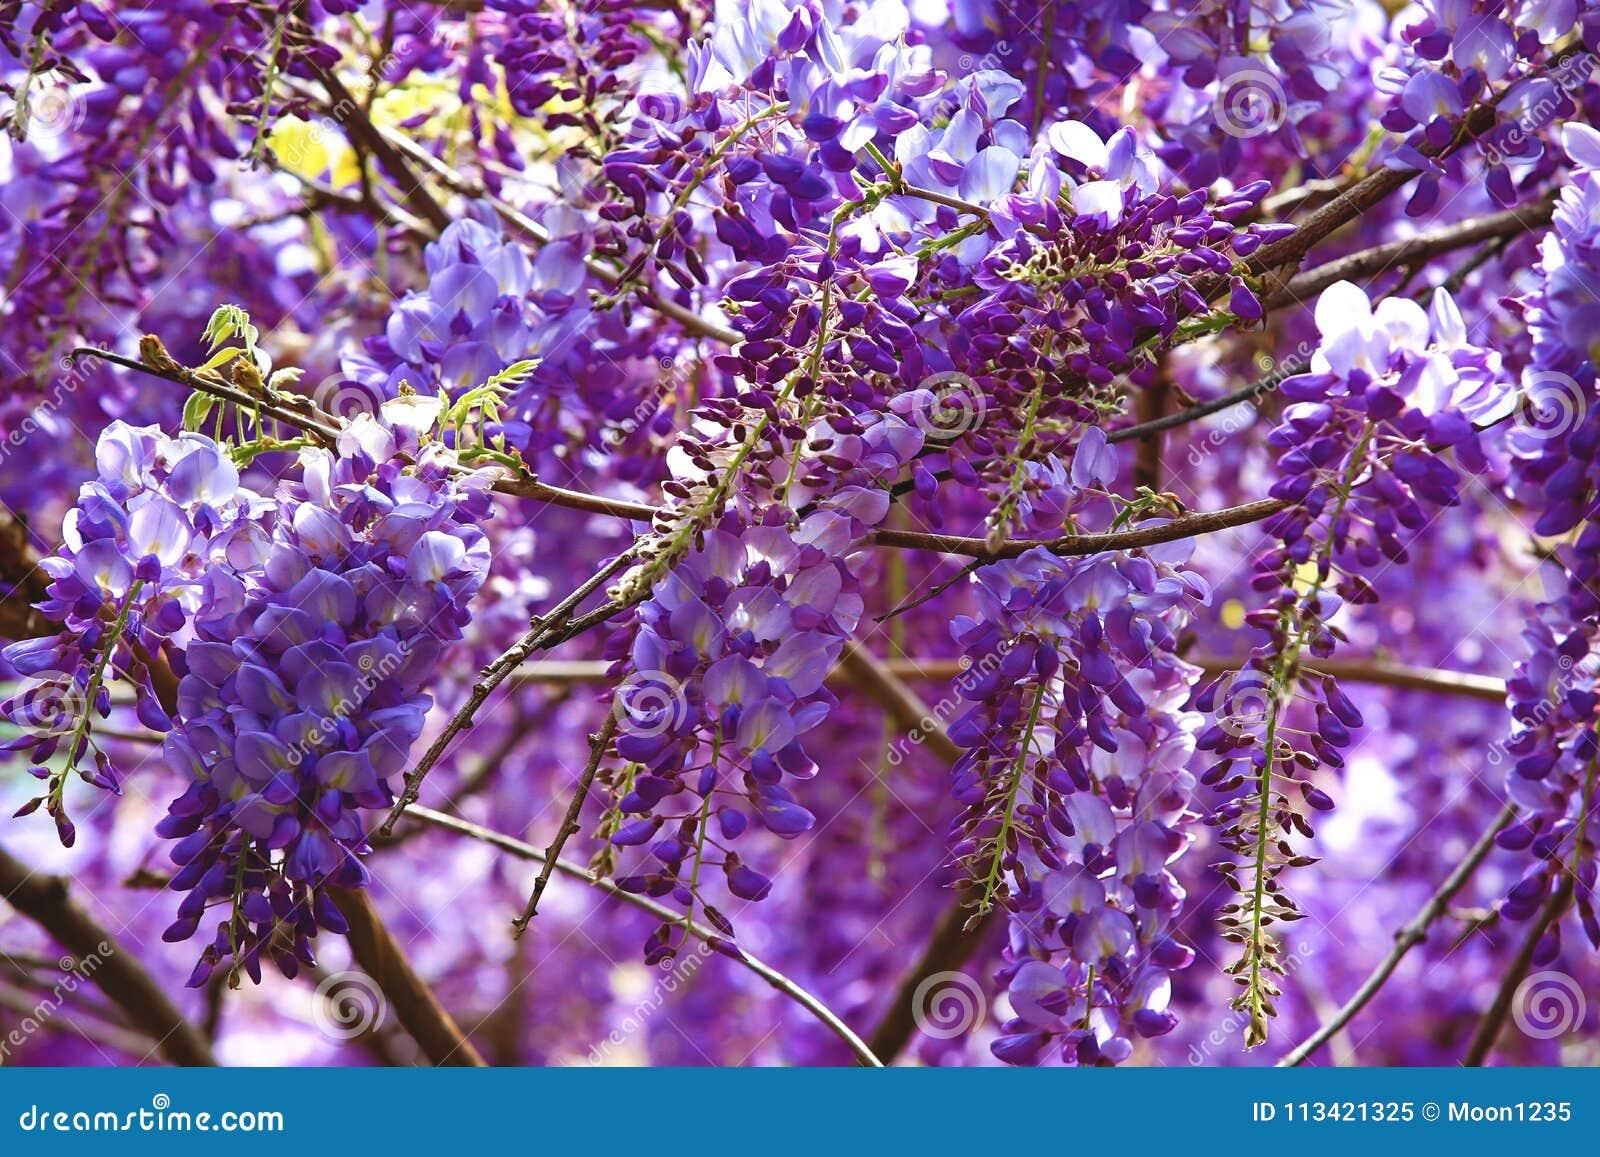 Purple wisteria flowersbean treechinese wisteriapurple vine stock download comp mightylinksfo